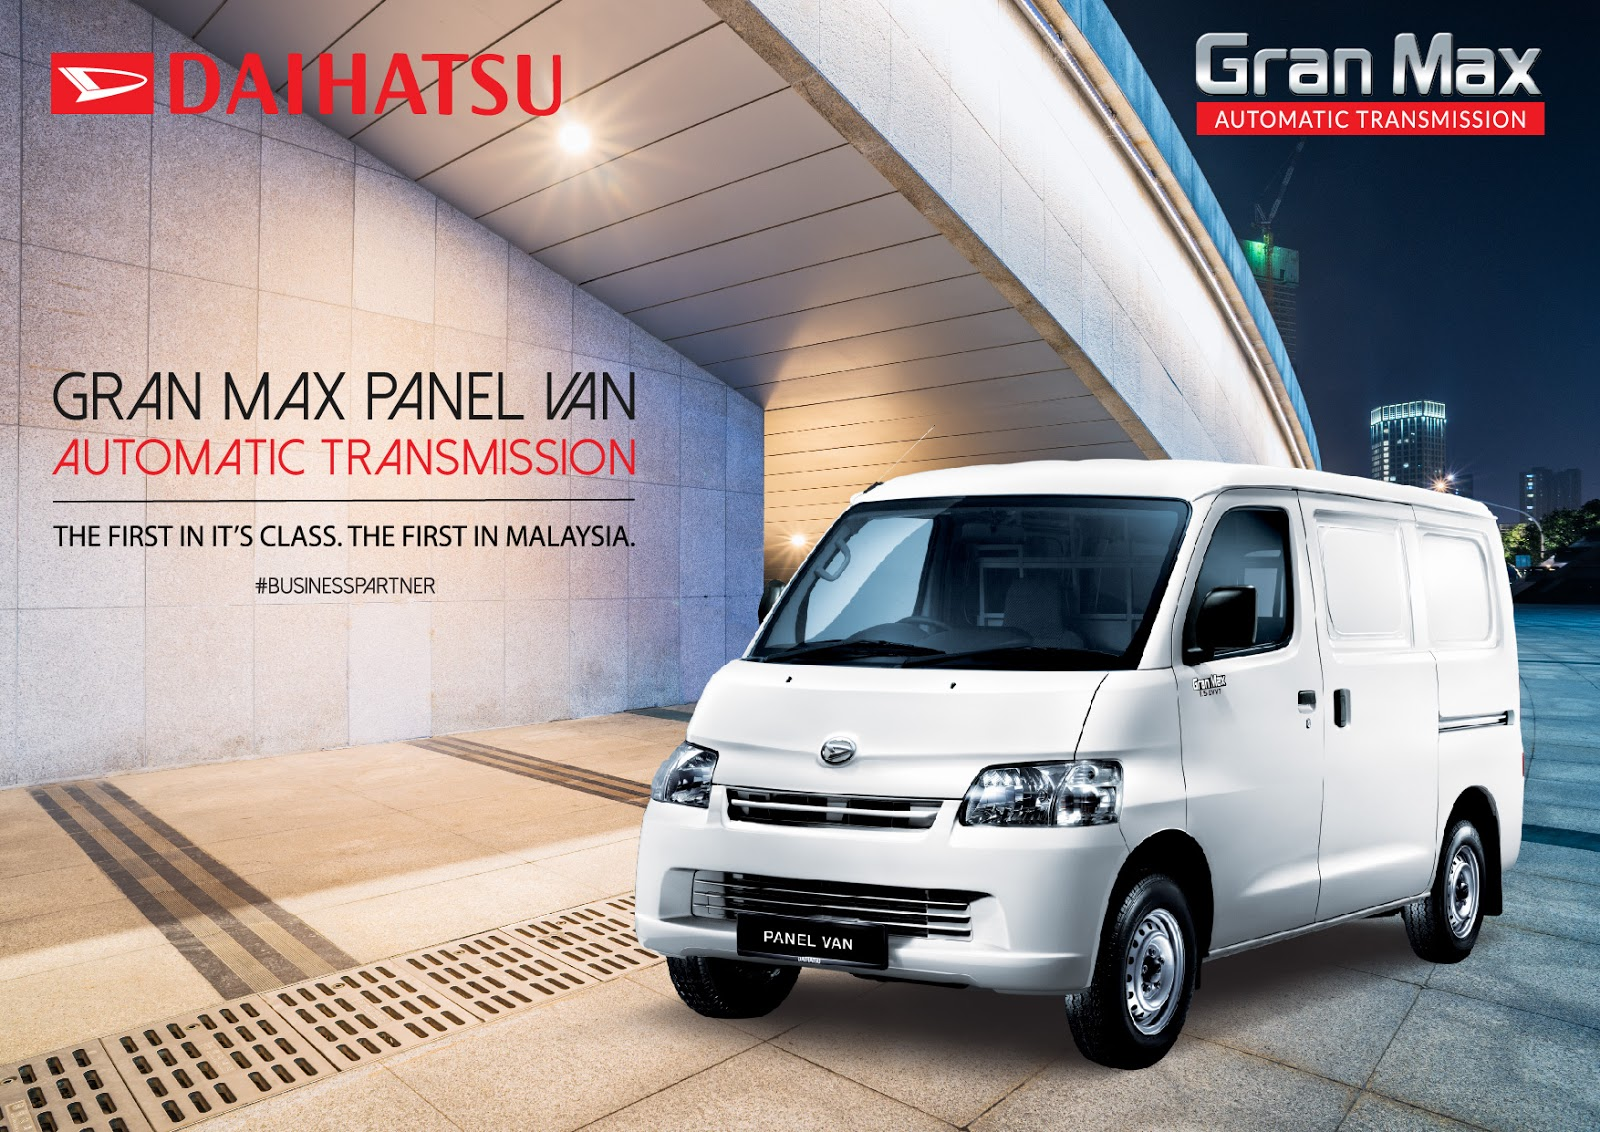 motoring malaysia daihatsu gran max panel van with automatic rh motoring malaysia blogspot com Harga Baru Daihatsu Grand Max Daihatsu Hijet 4x4